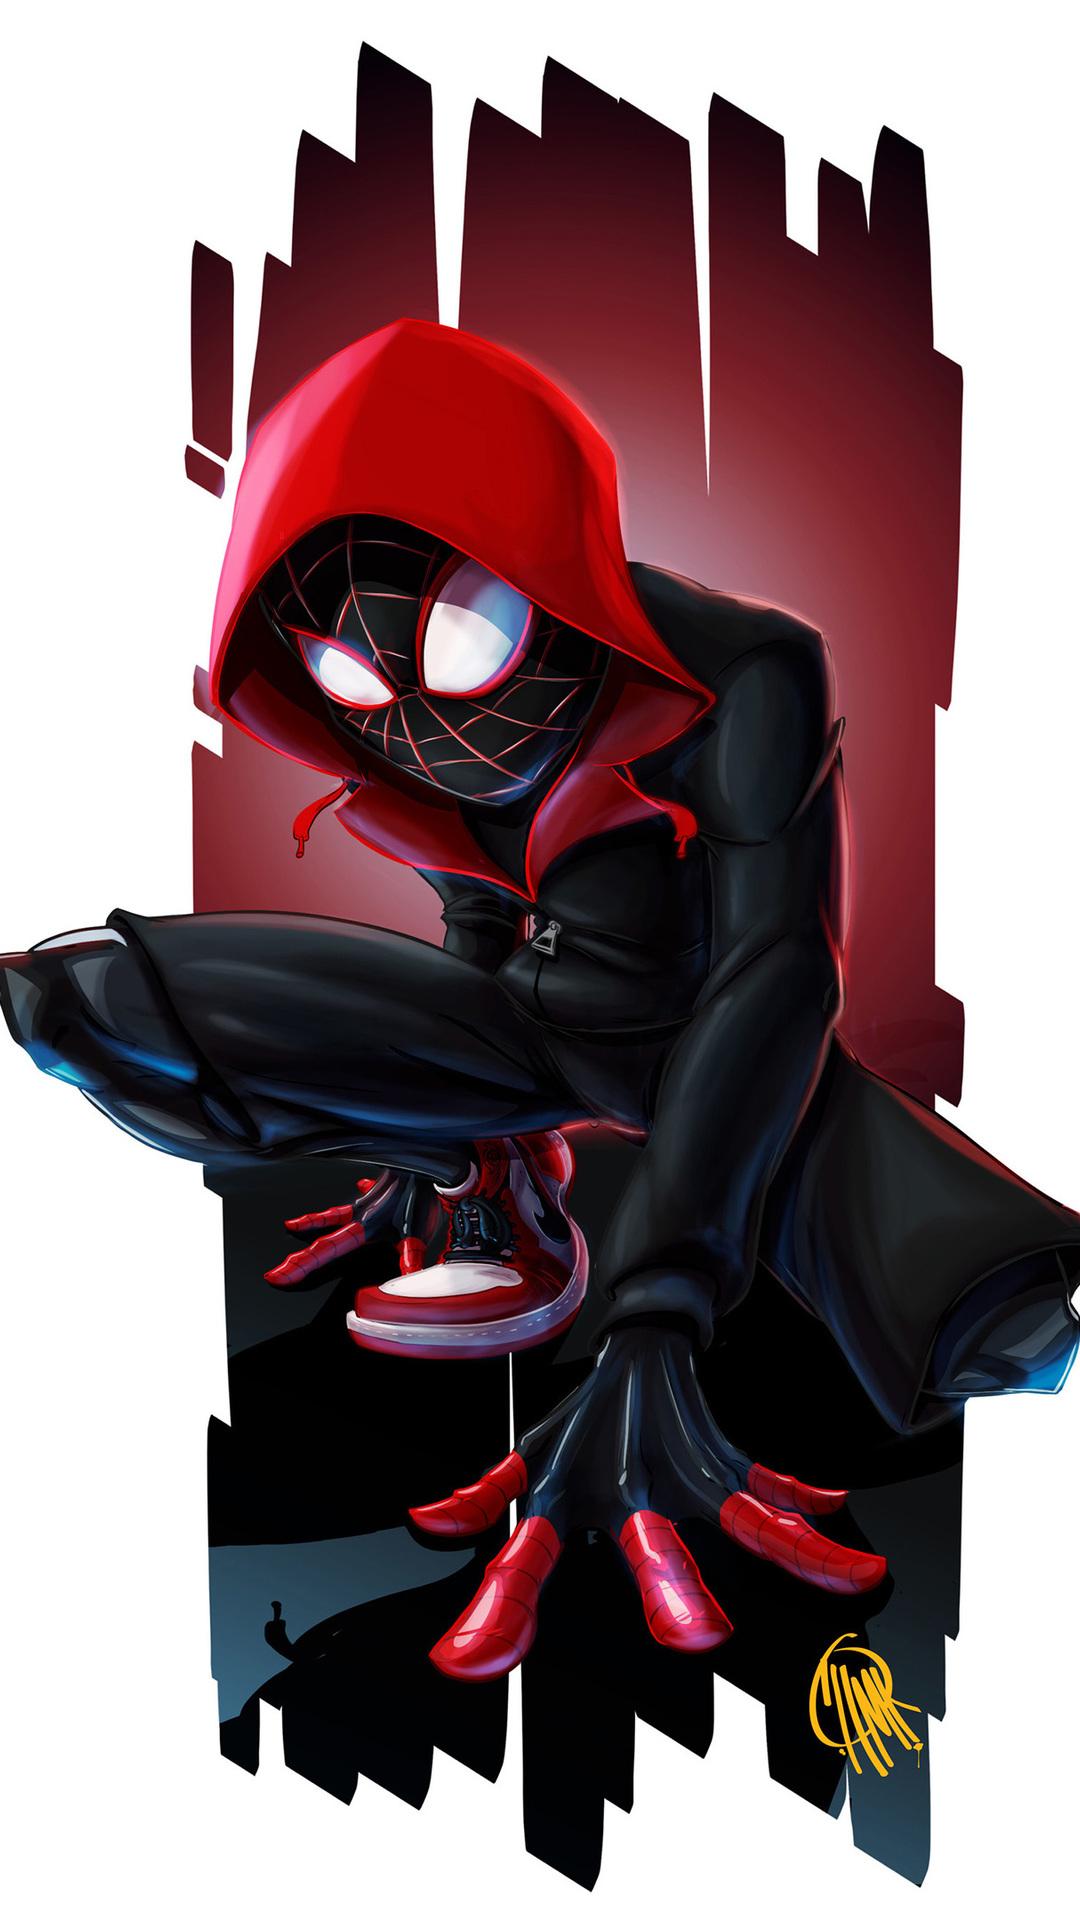 Spiderman Miles Morales Wallpaper